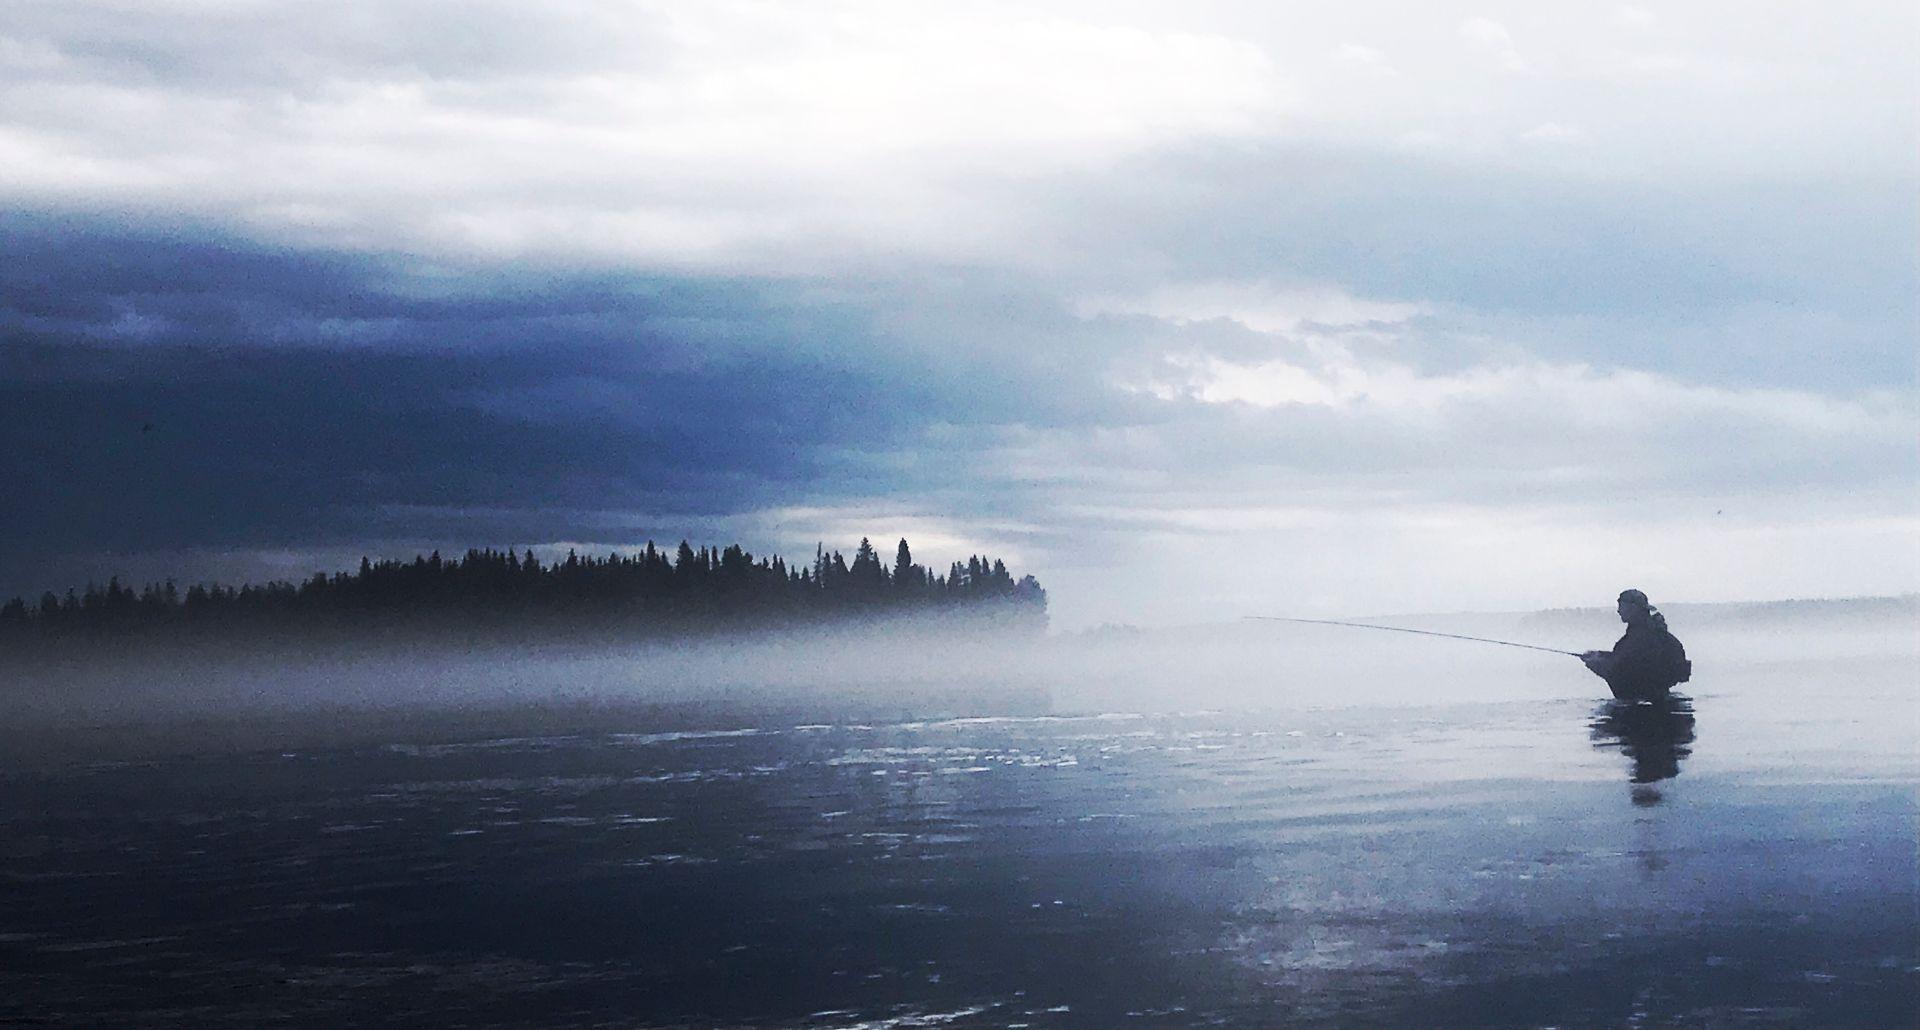 En förtrollad stund i Drömfiskeland Foto Anders Lundin